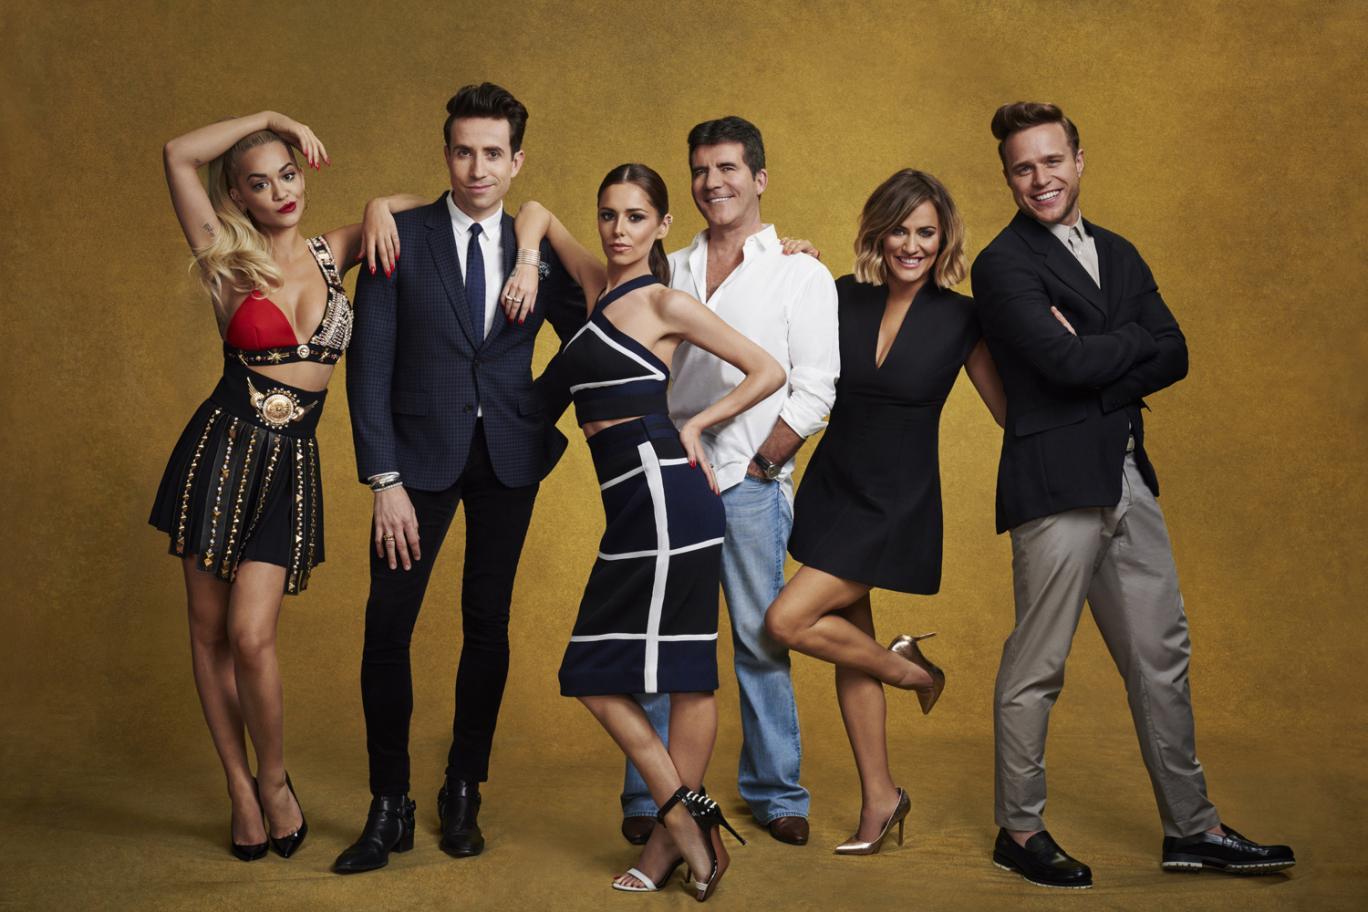 The X Factor 2015: Caroline Flack et Olly Murs reçoivent un message inattendu!